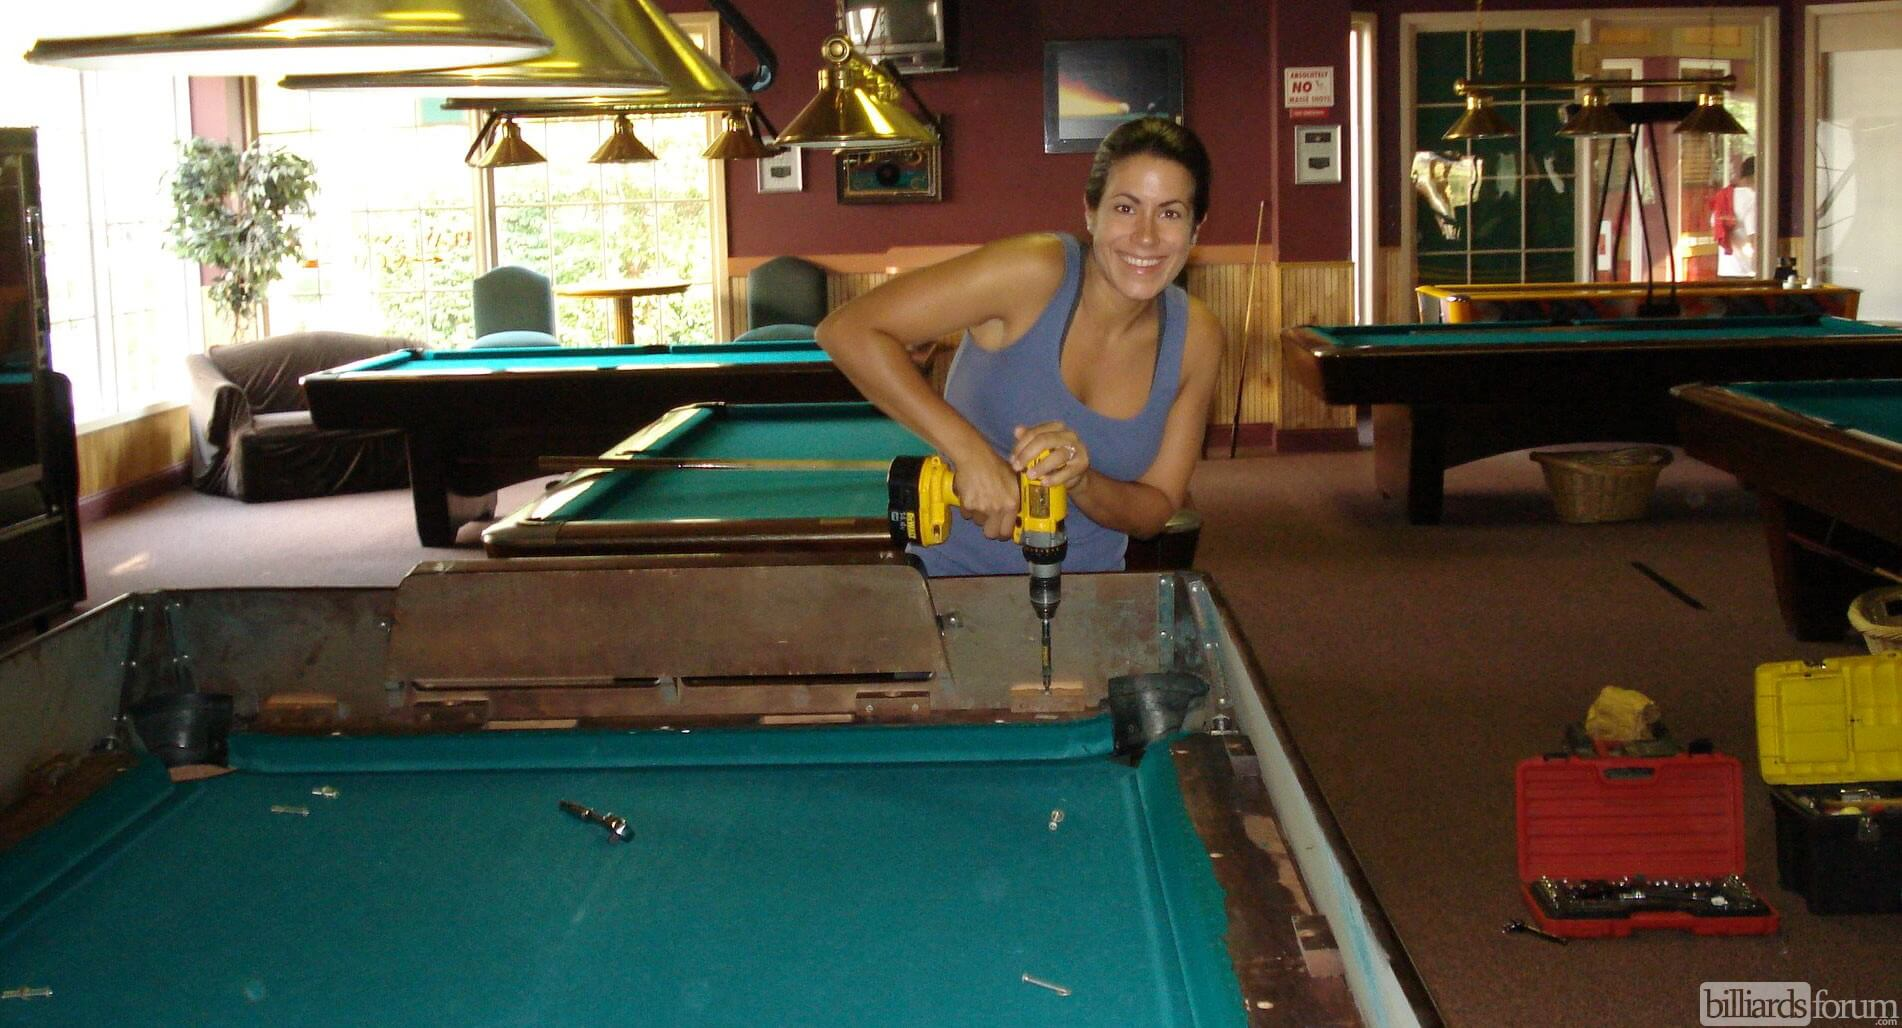 Players Billiards Café Eatontown - Pool table service nj